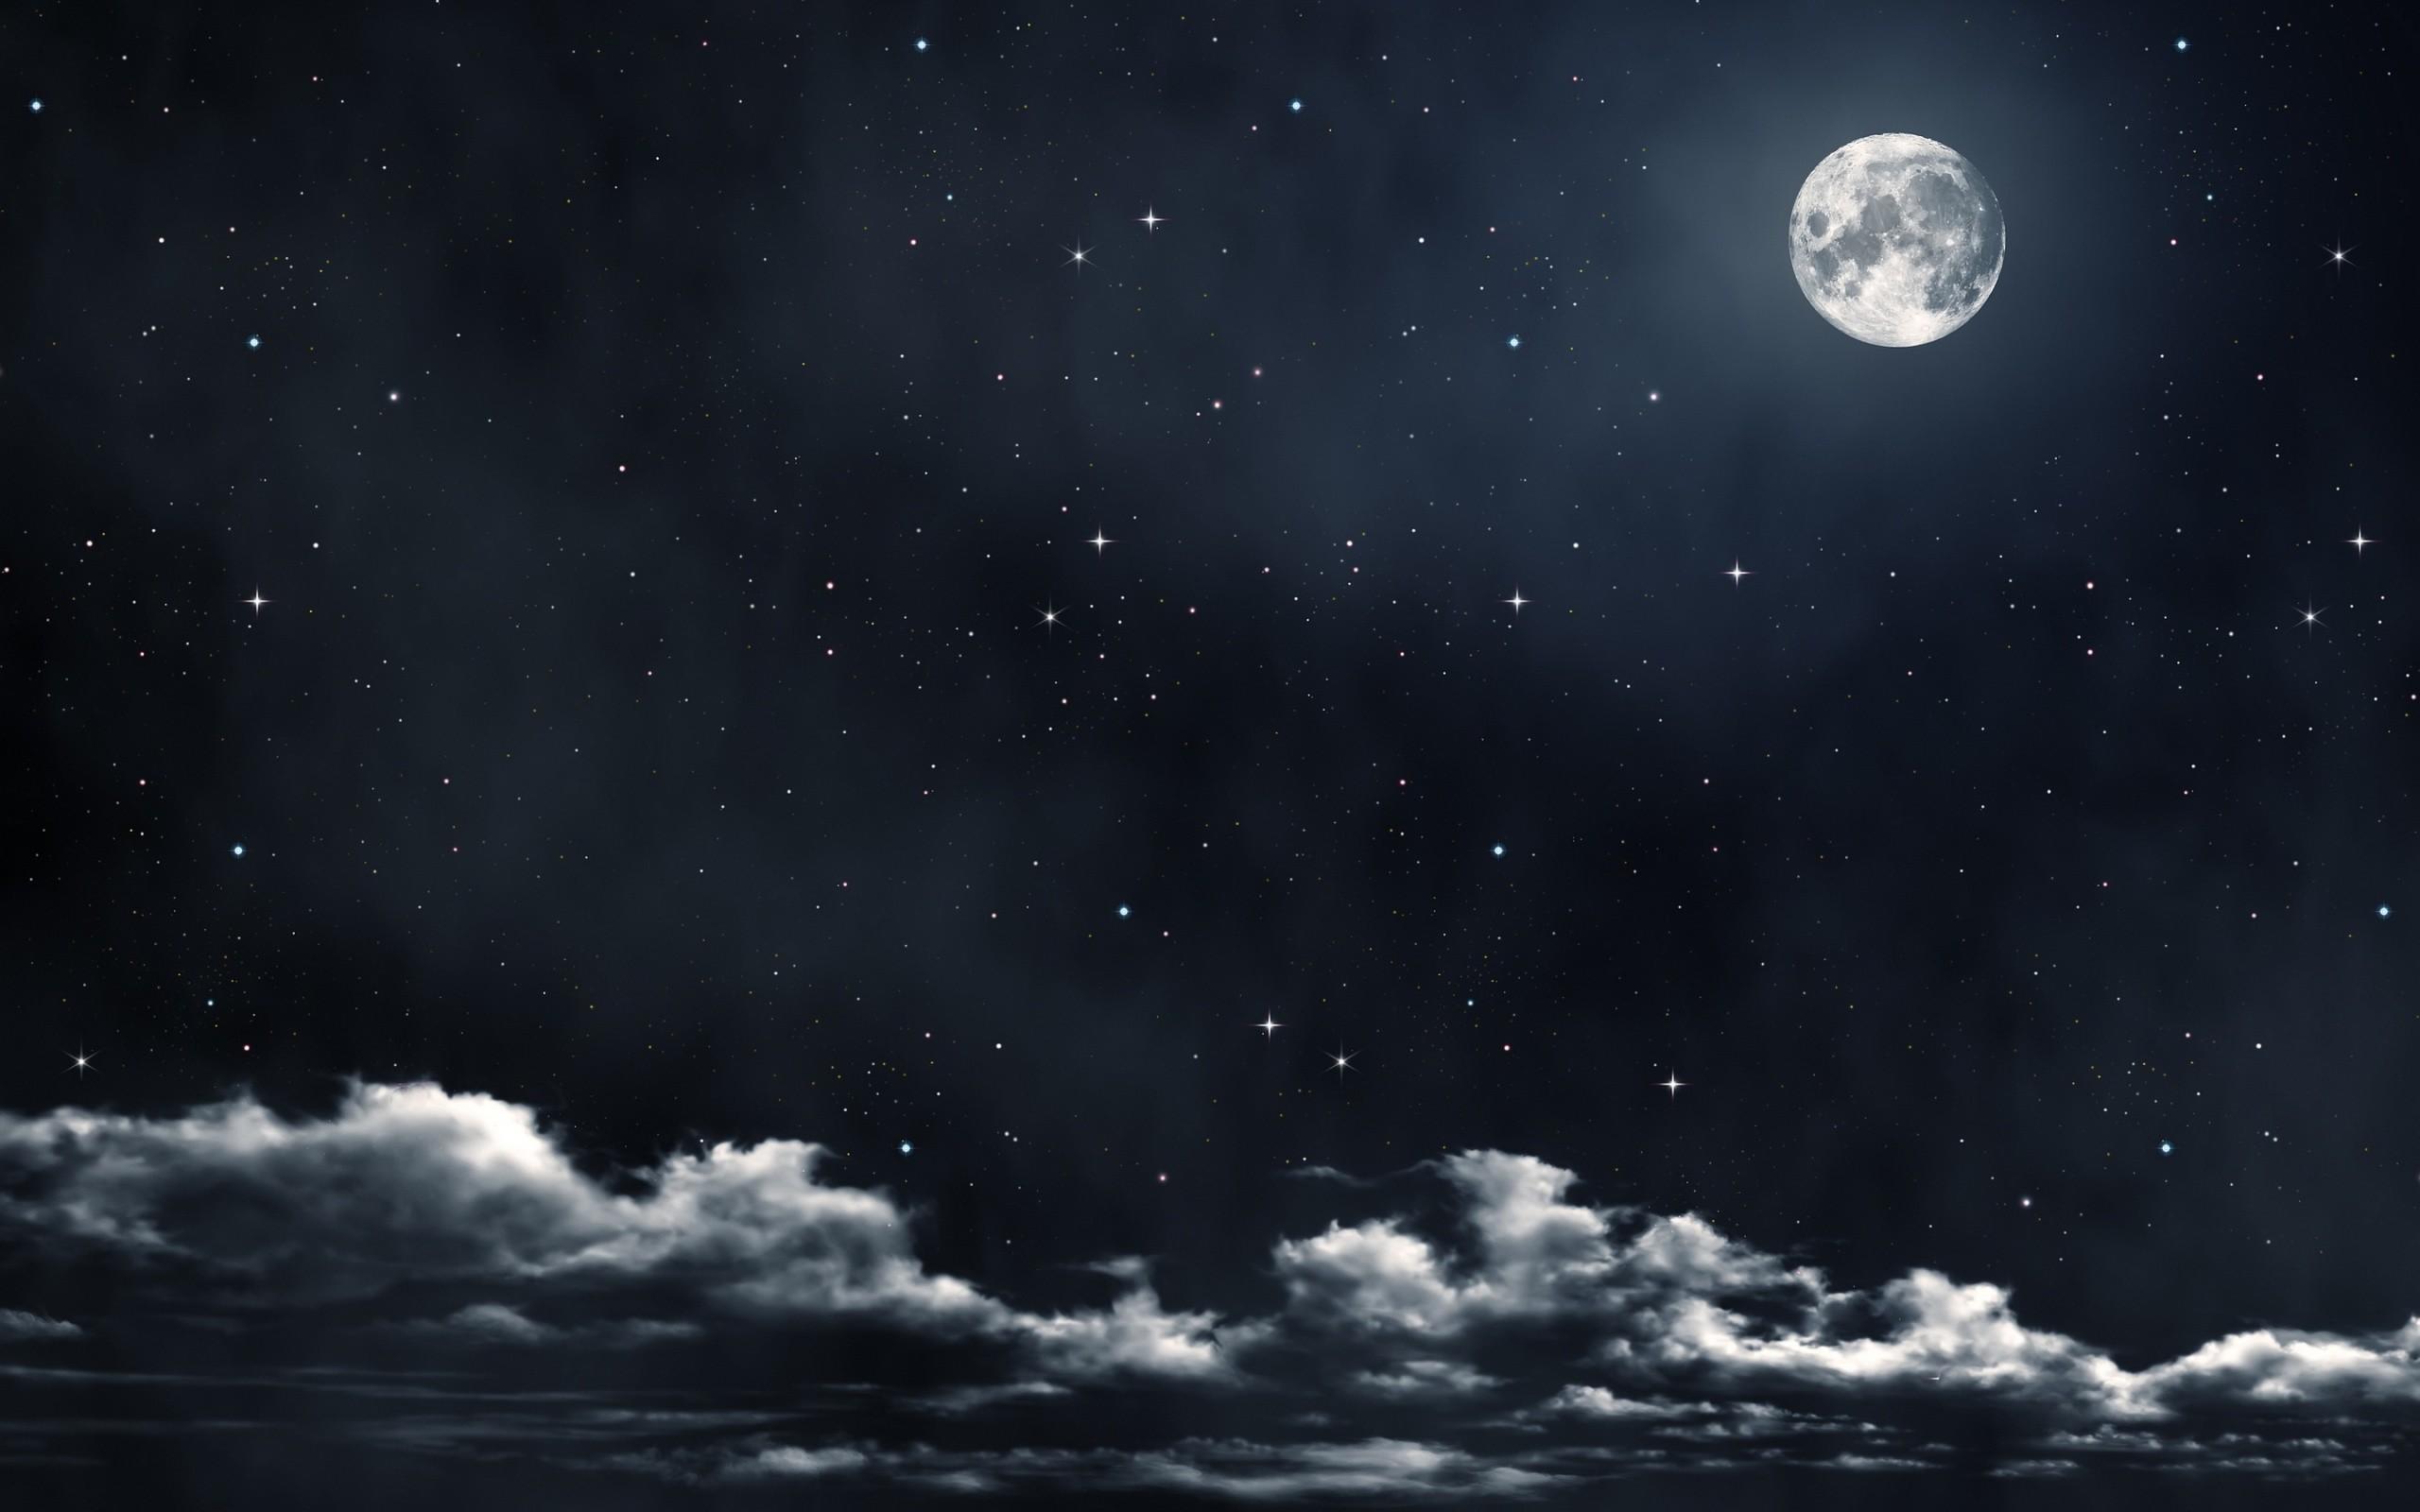 wallpaper.wiki-Download-Free-Sun-Moon-Stars-Wallpaper-